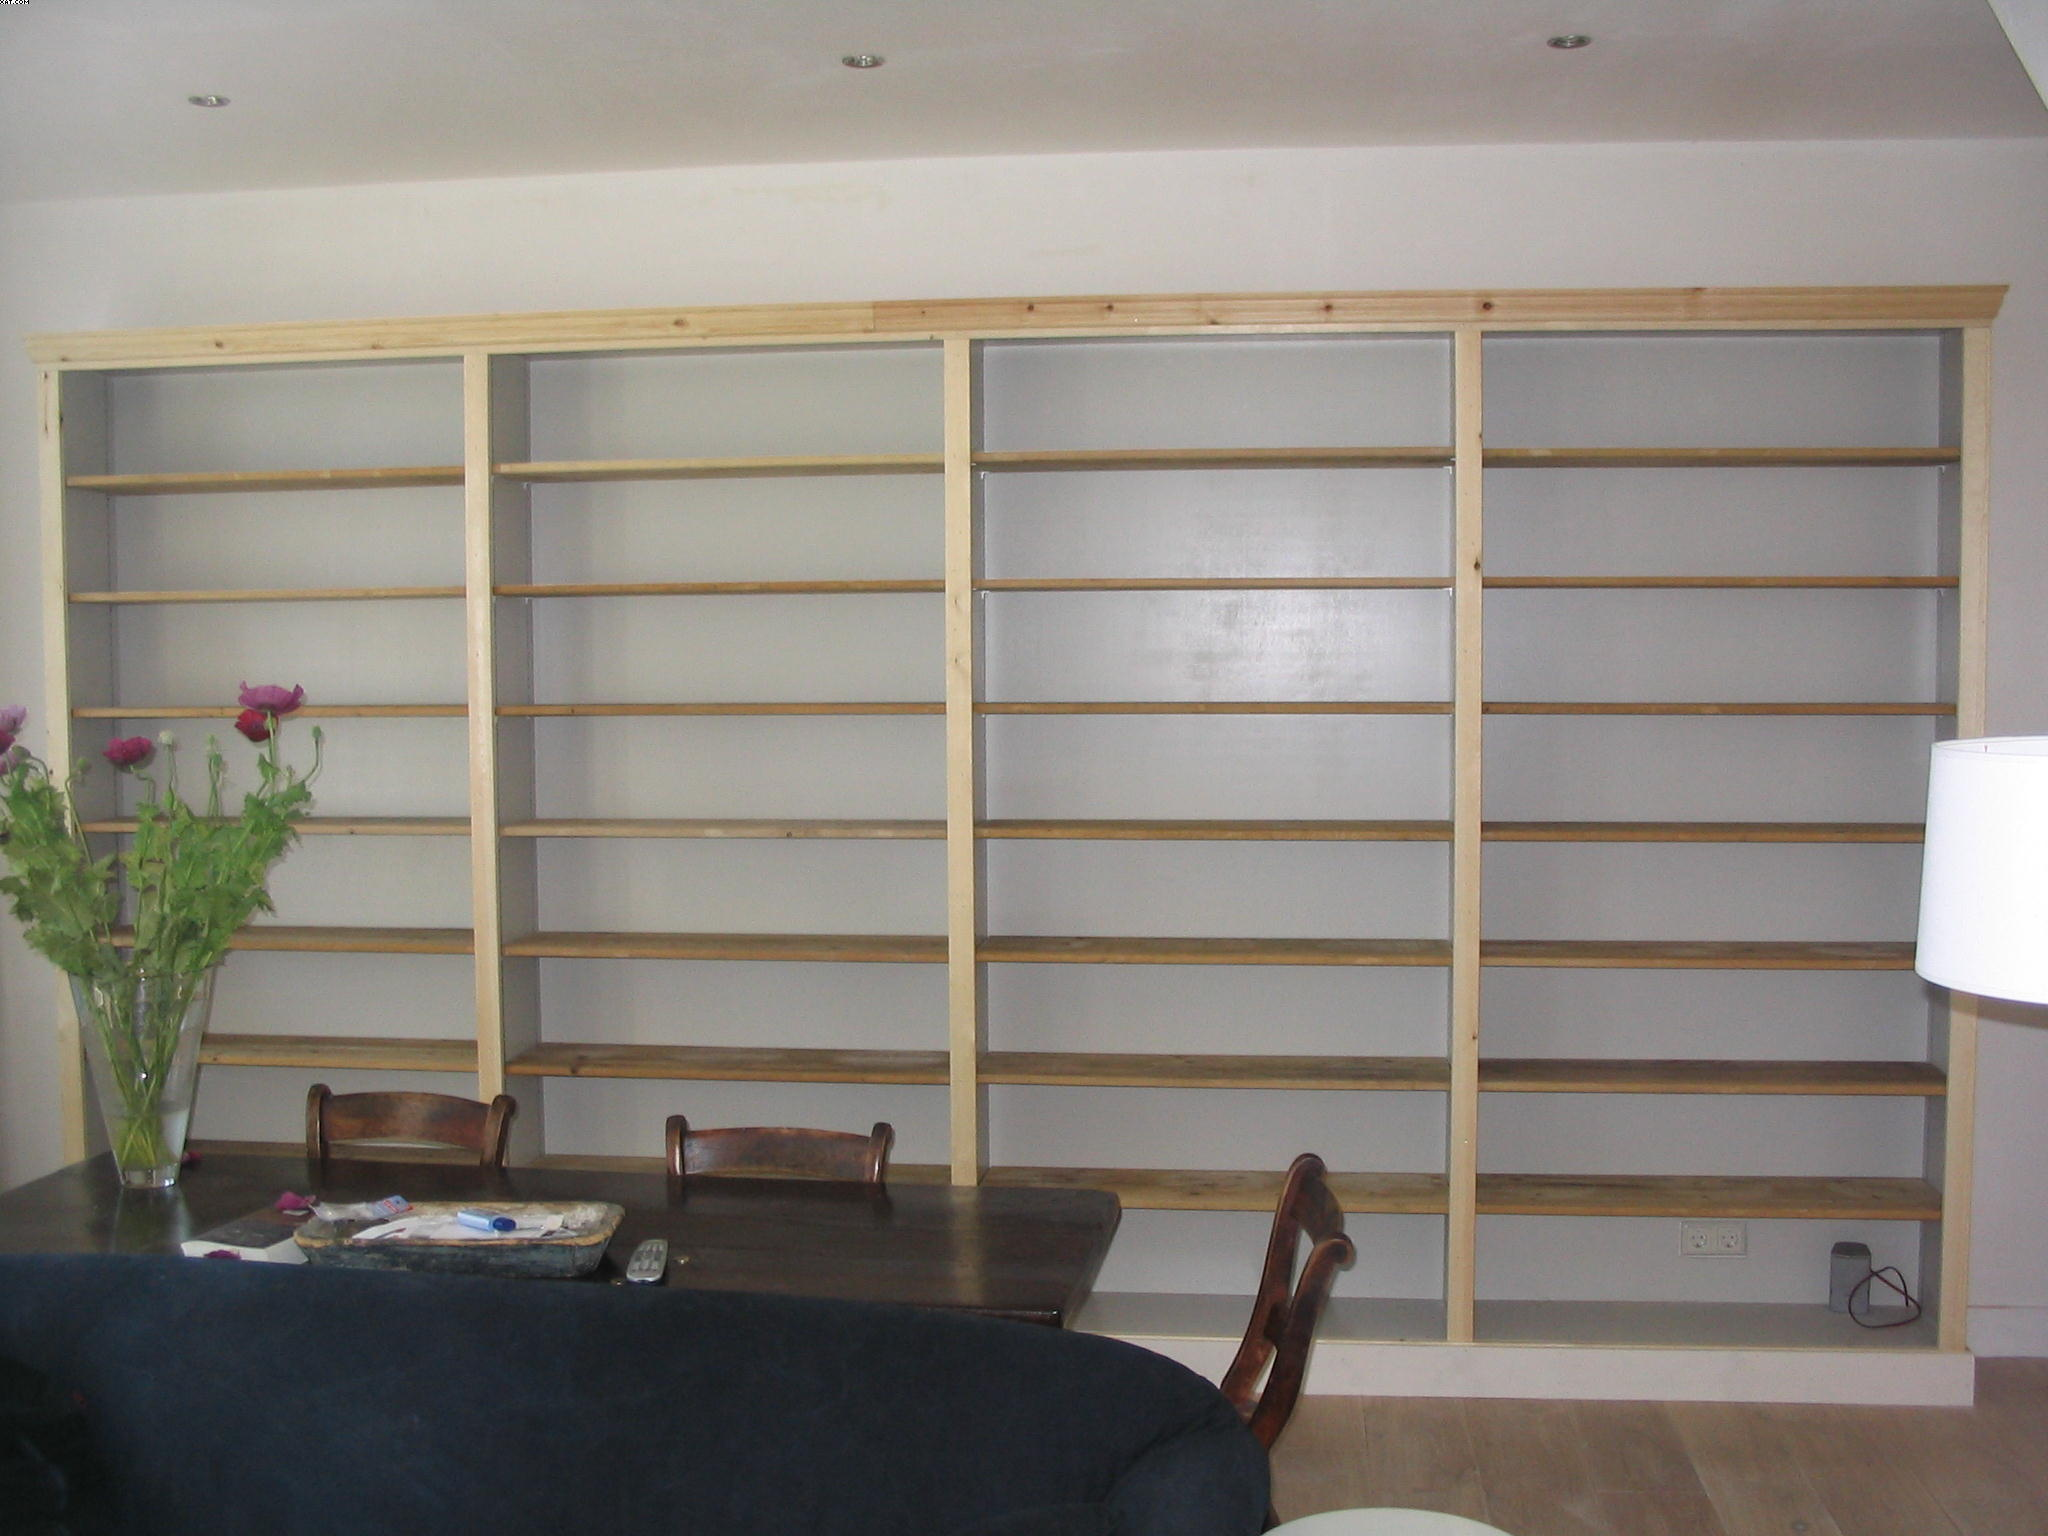 Boekenkast - Chris de Graaf Interieurtimmerwerk